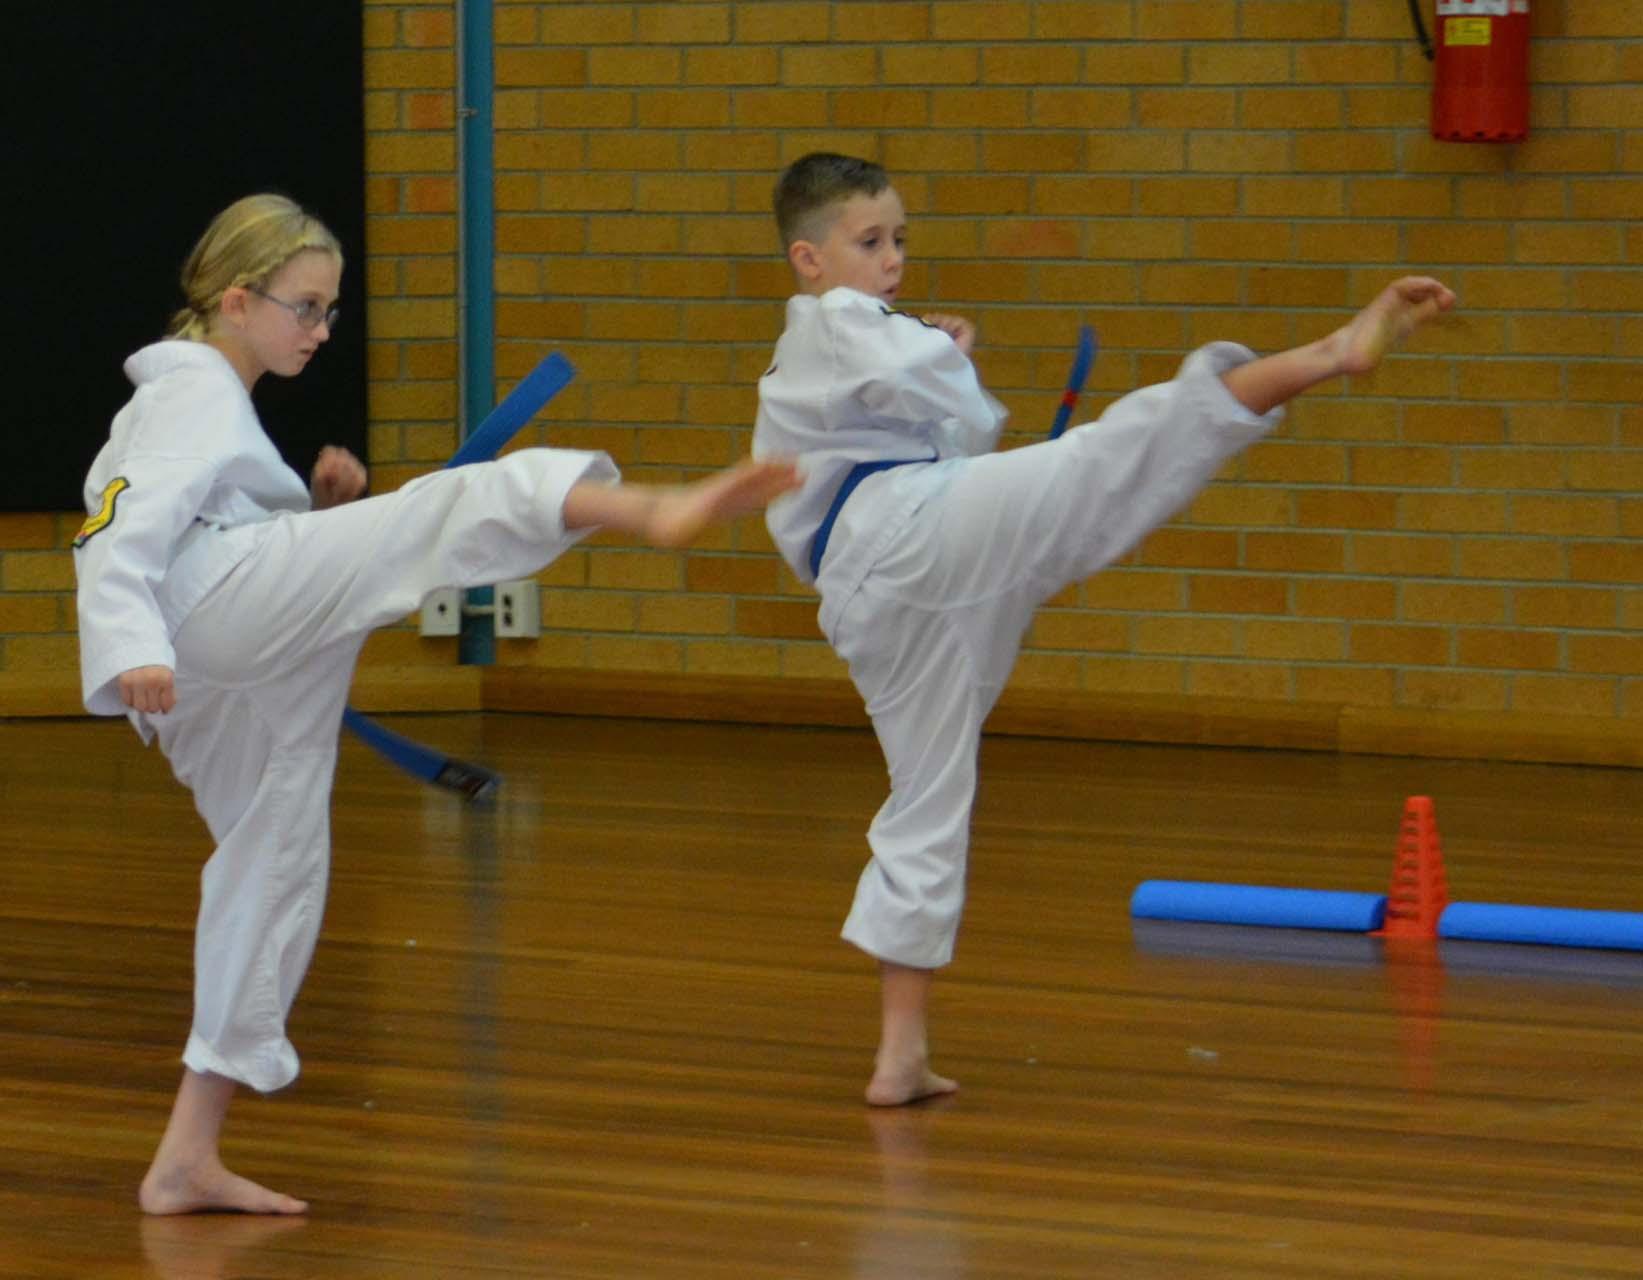 Two blue belt martial arts students practicing their high kicks at Tamworth martial arts.